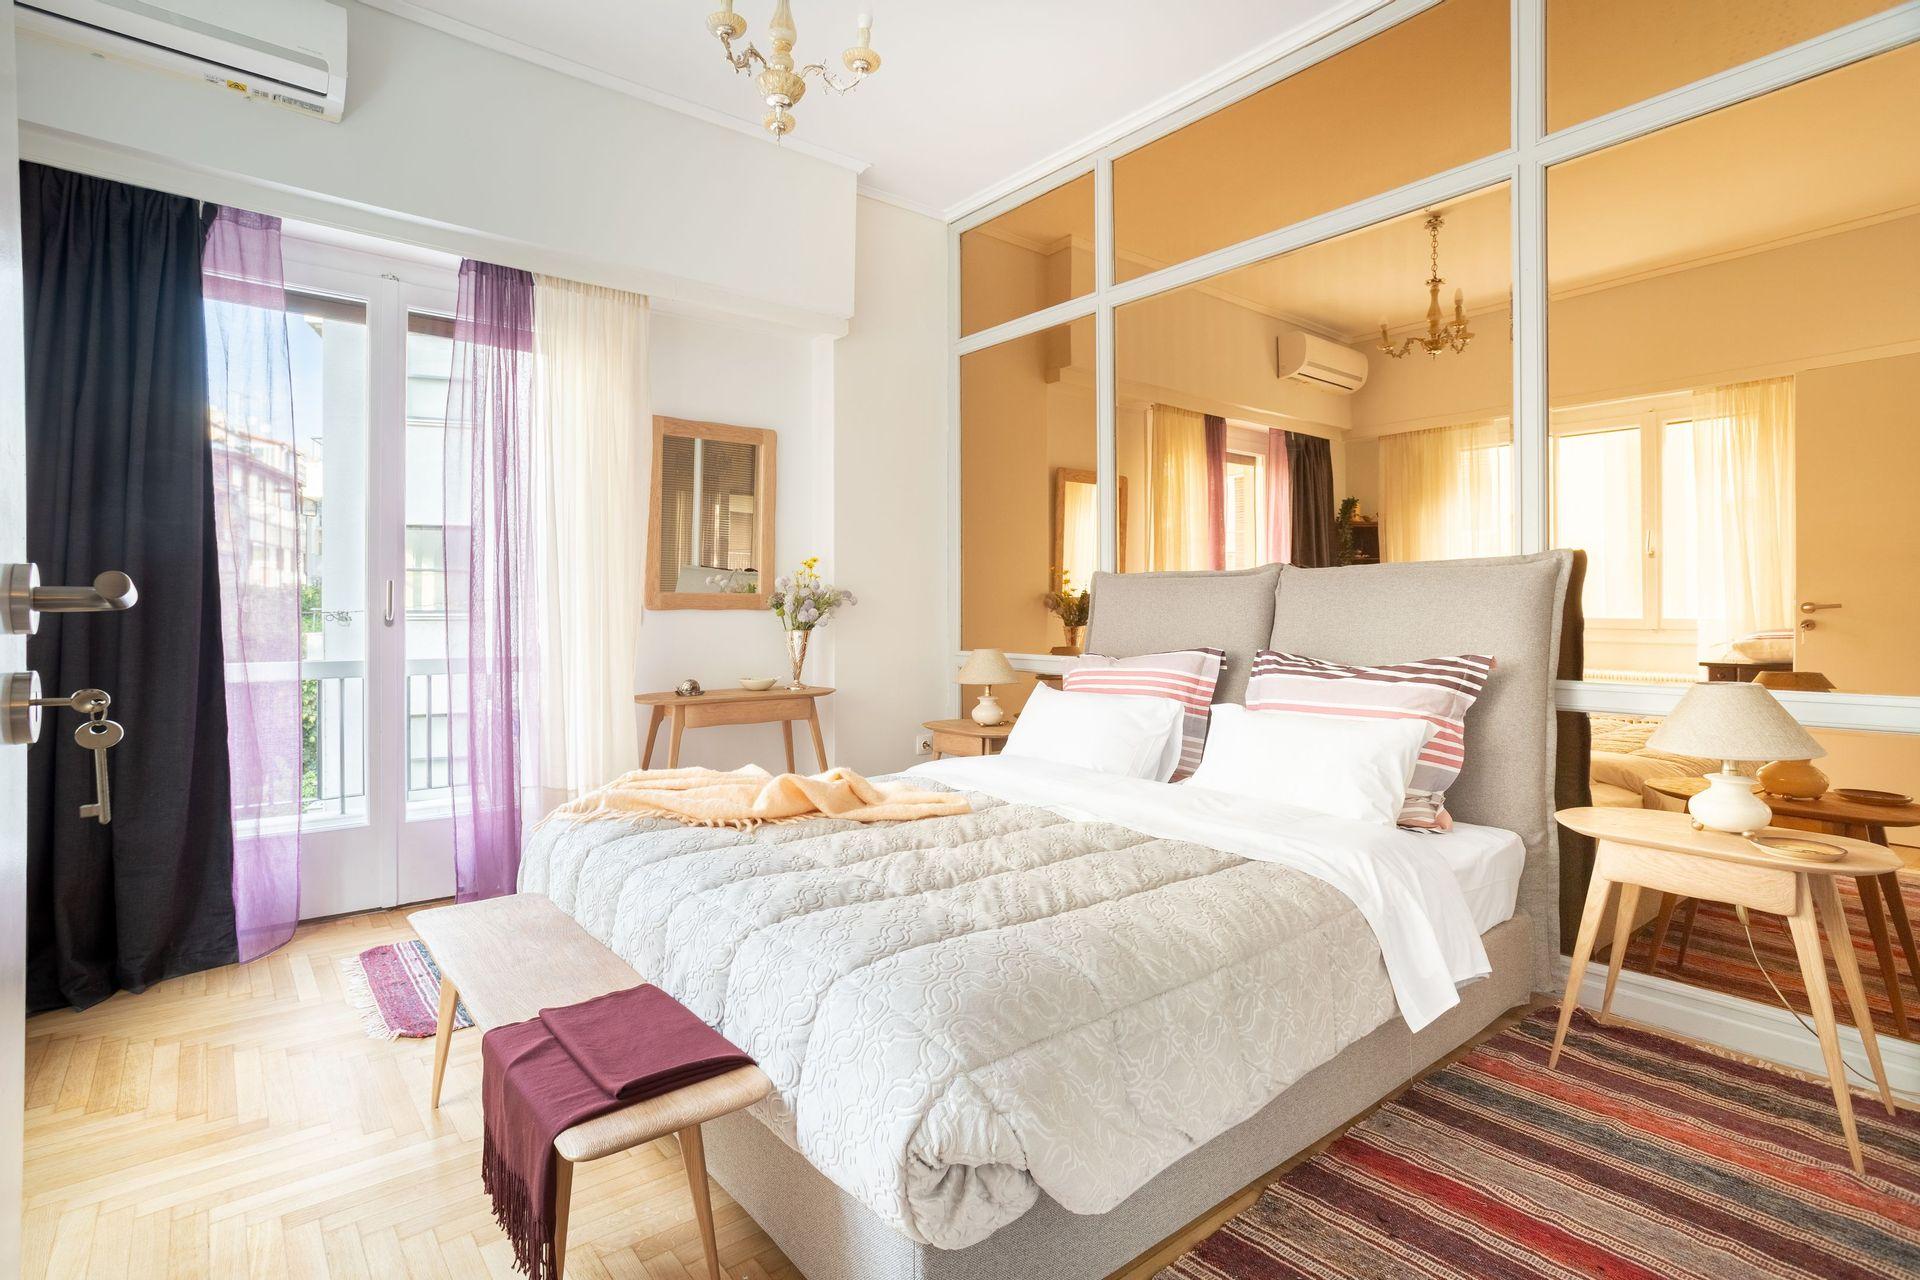 Athenian Homes - Αθήνα ✦ 2 Ημέρες (1 Διανυκτέρευση) ✦ 2 άτομα ✦ Χωρίς Πρωινό ✦ έως 31/08/2022 ✦ Υπέροχη Τοποθεσία!